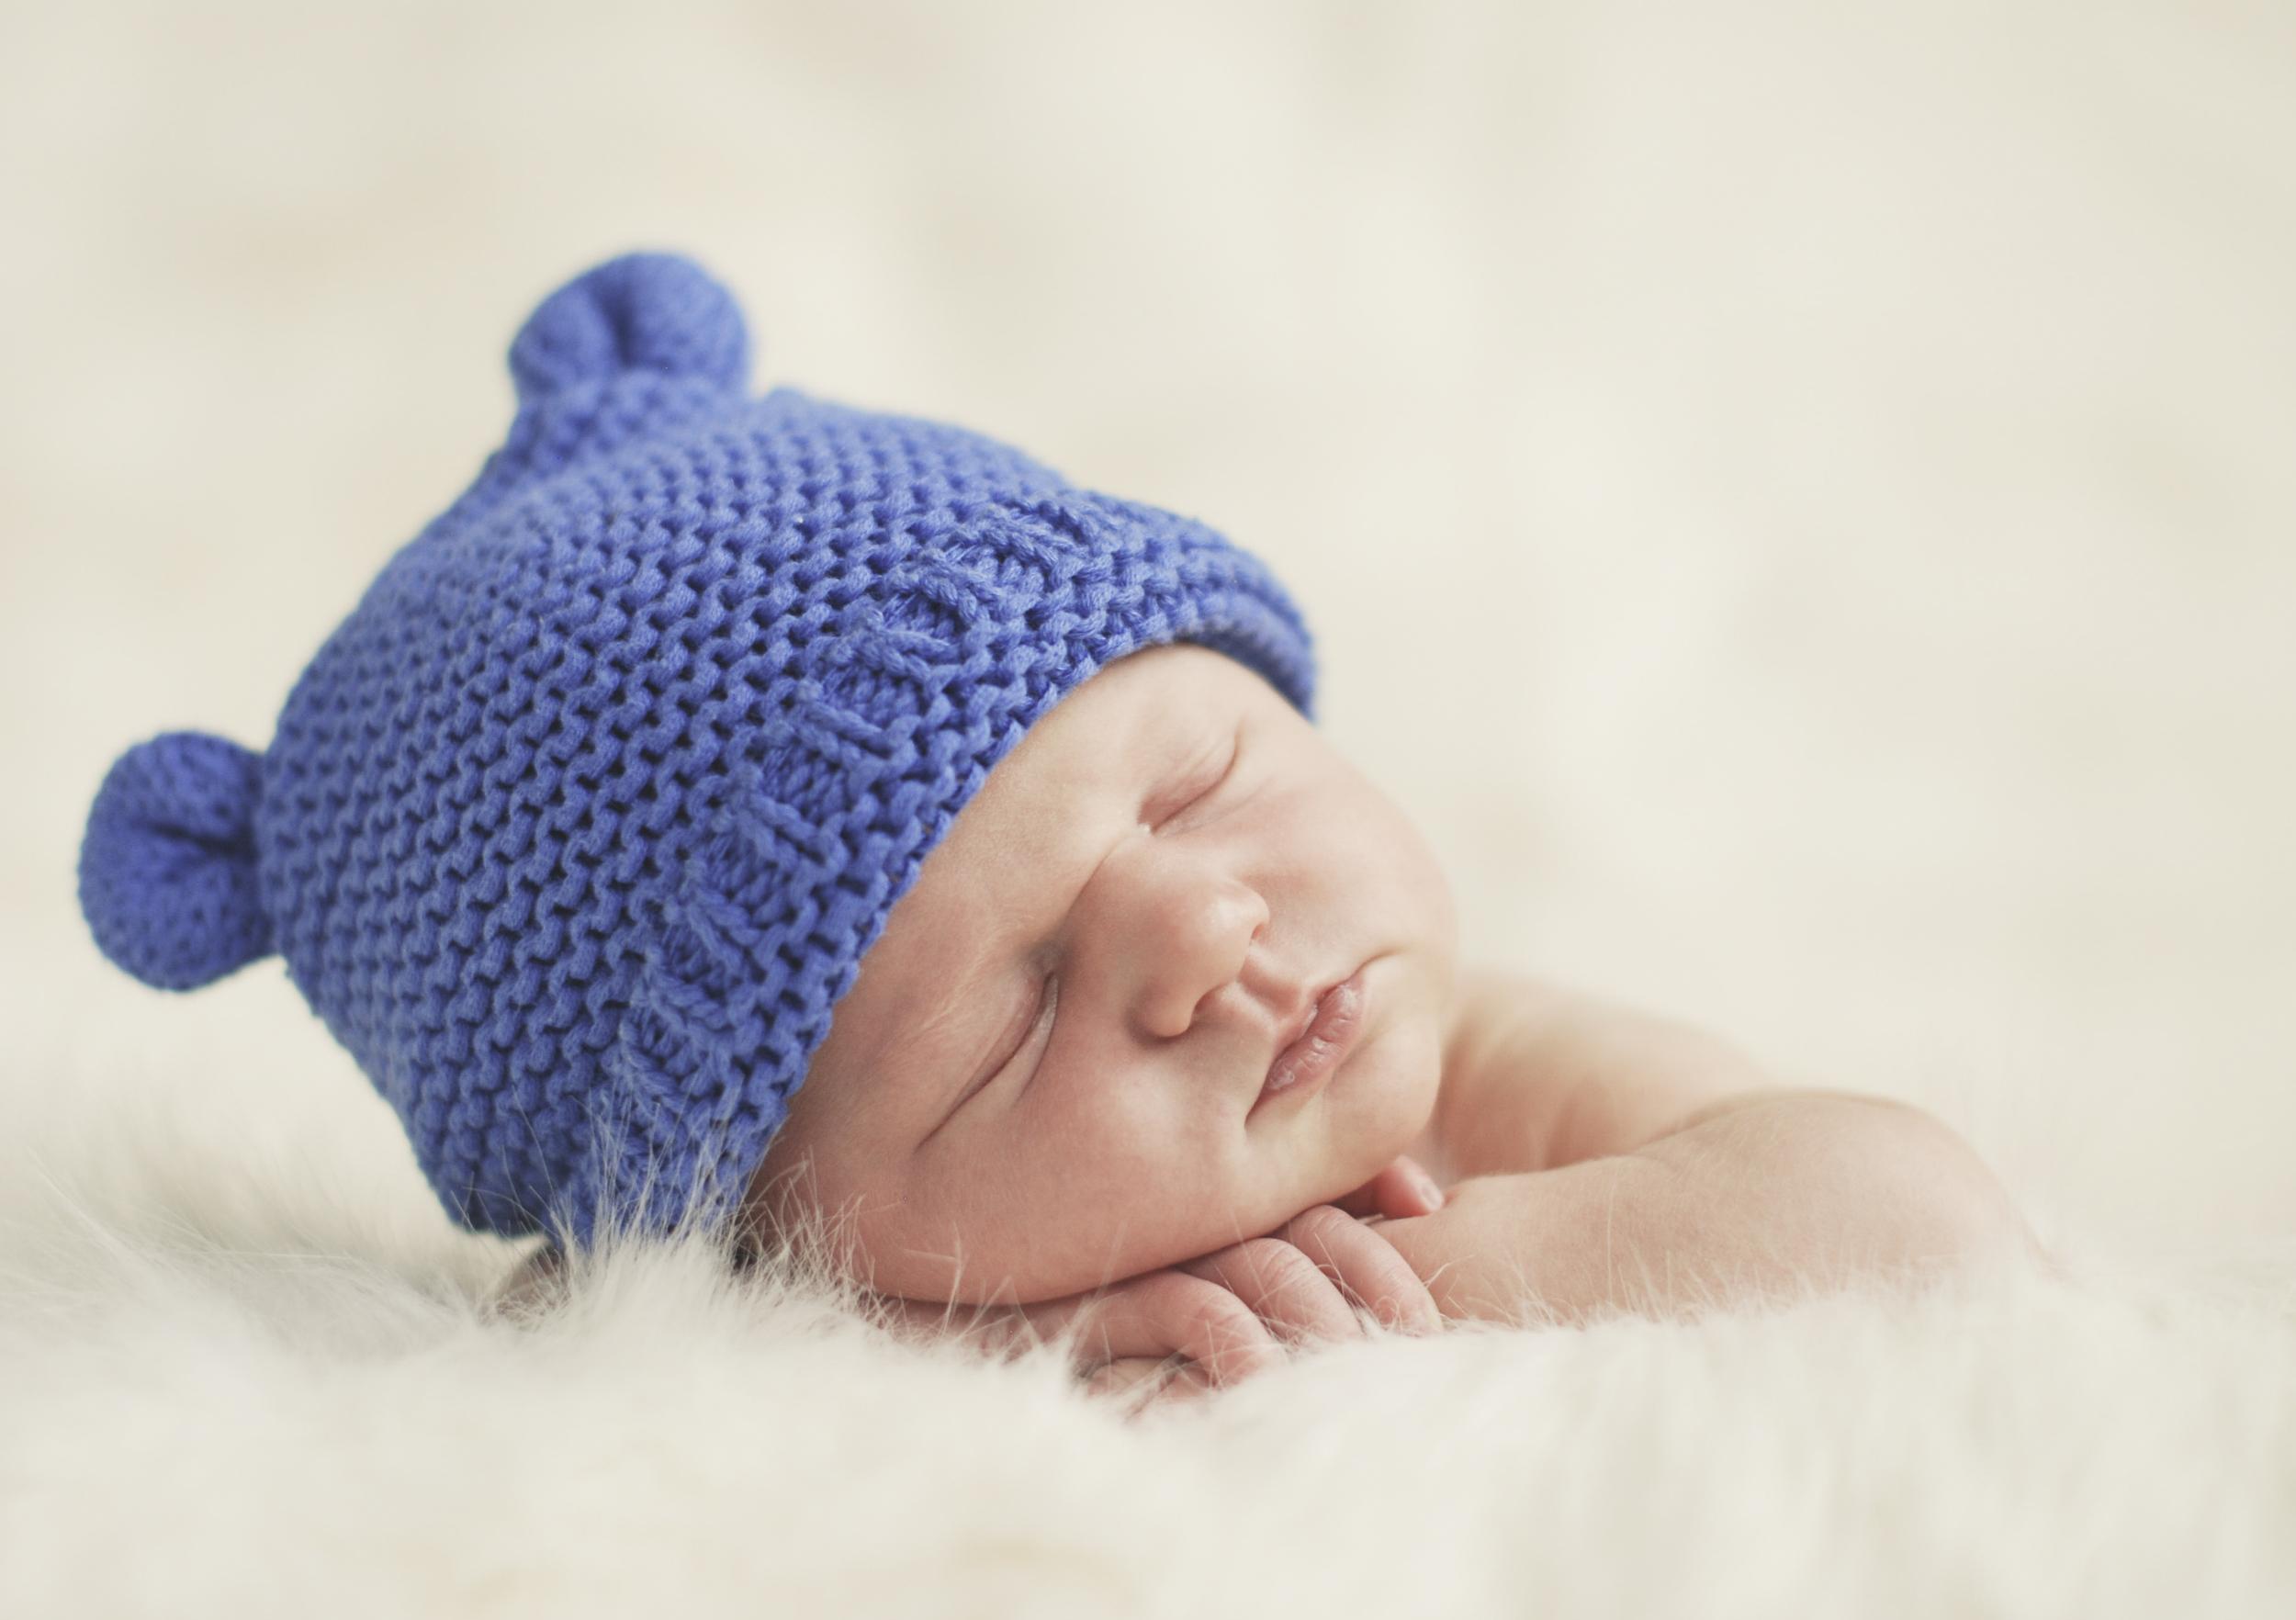 baby wells edited-10.jpg